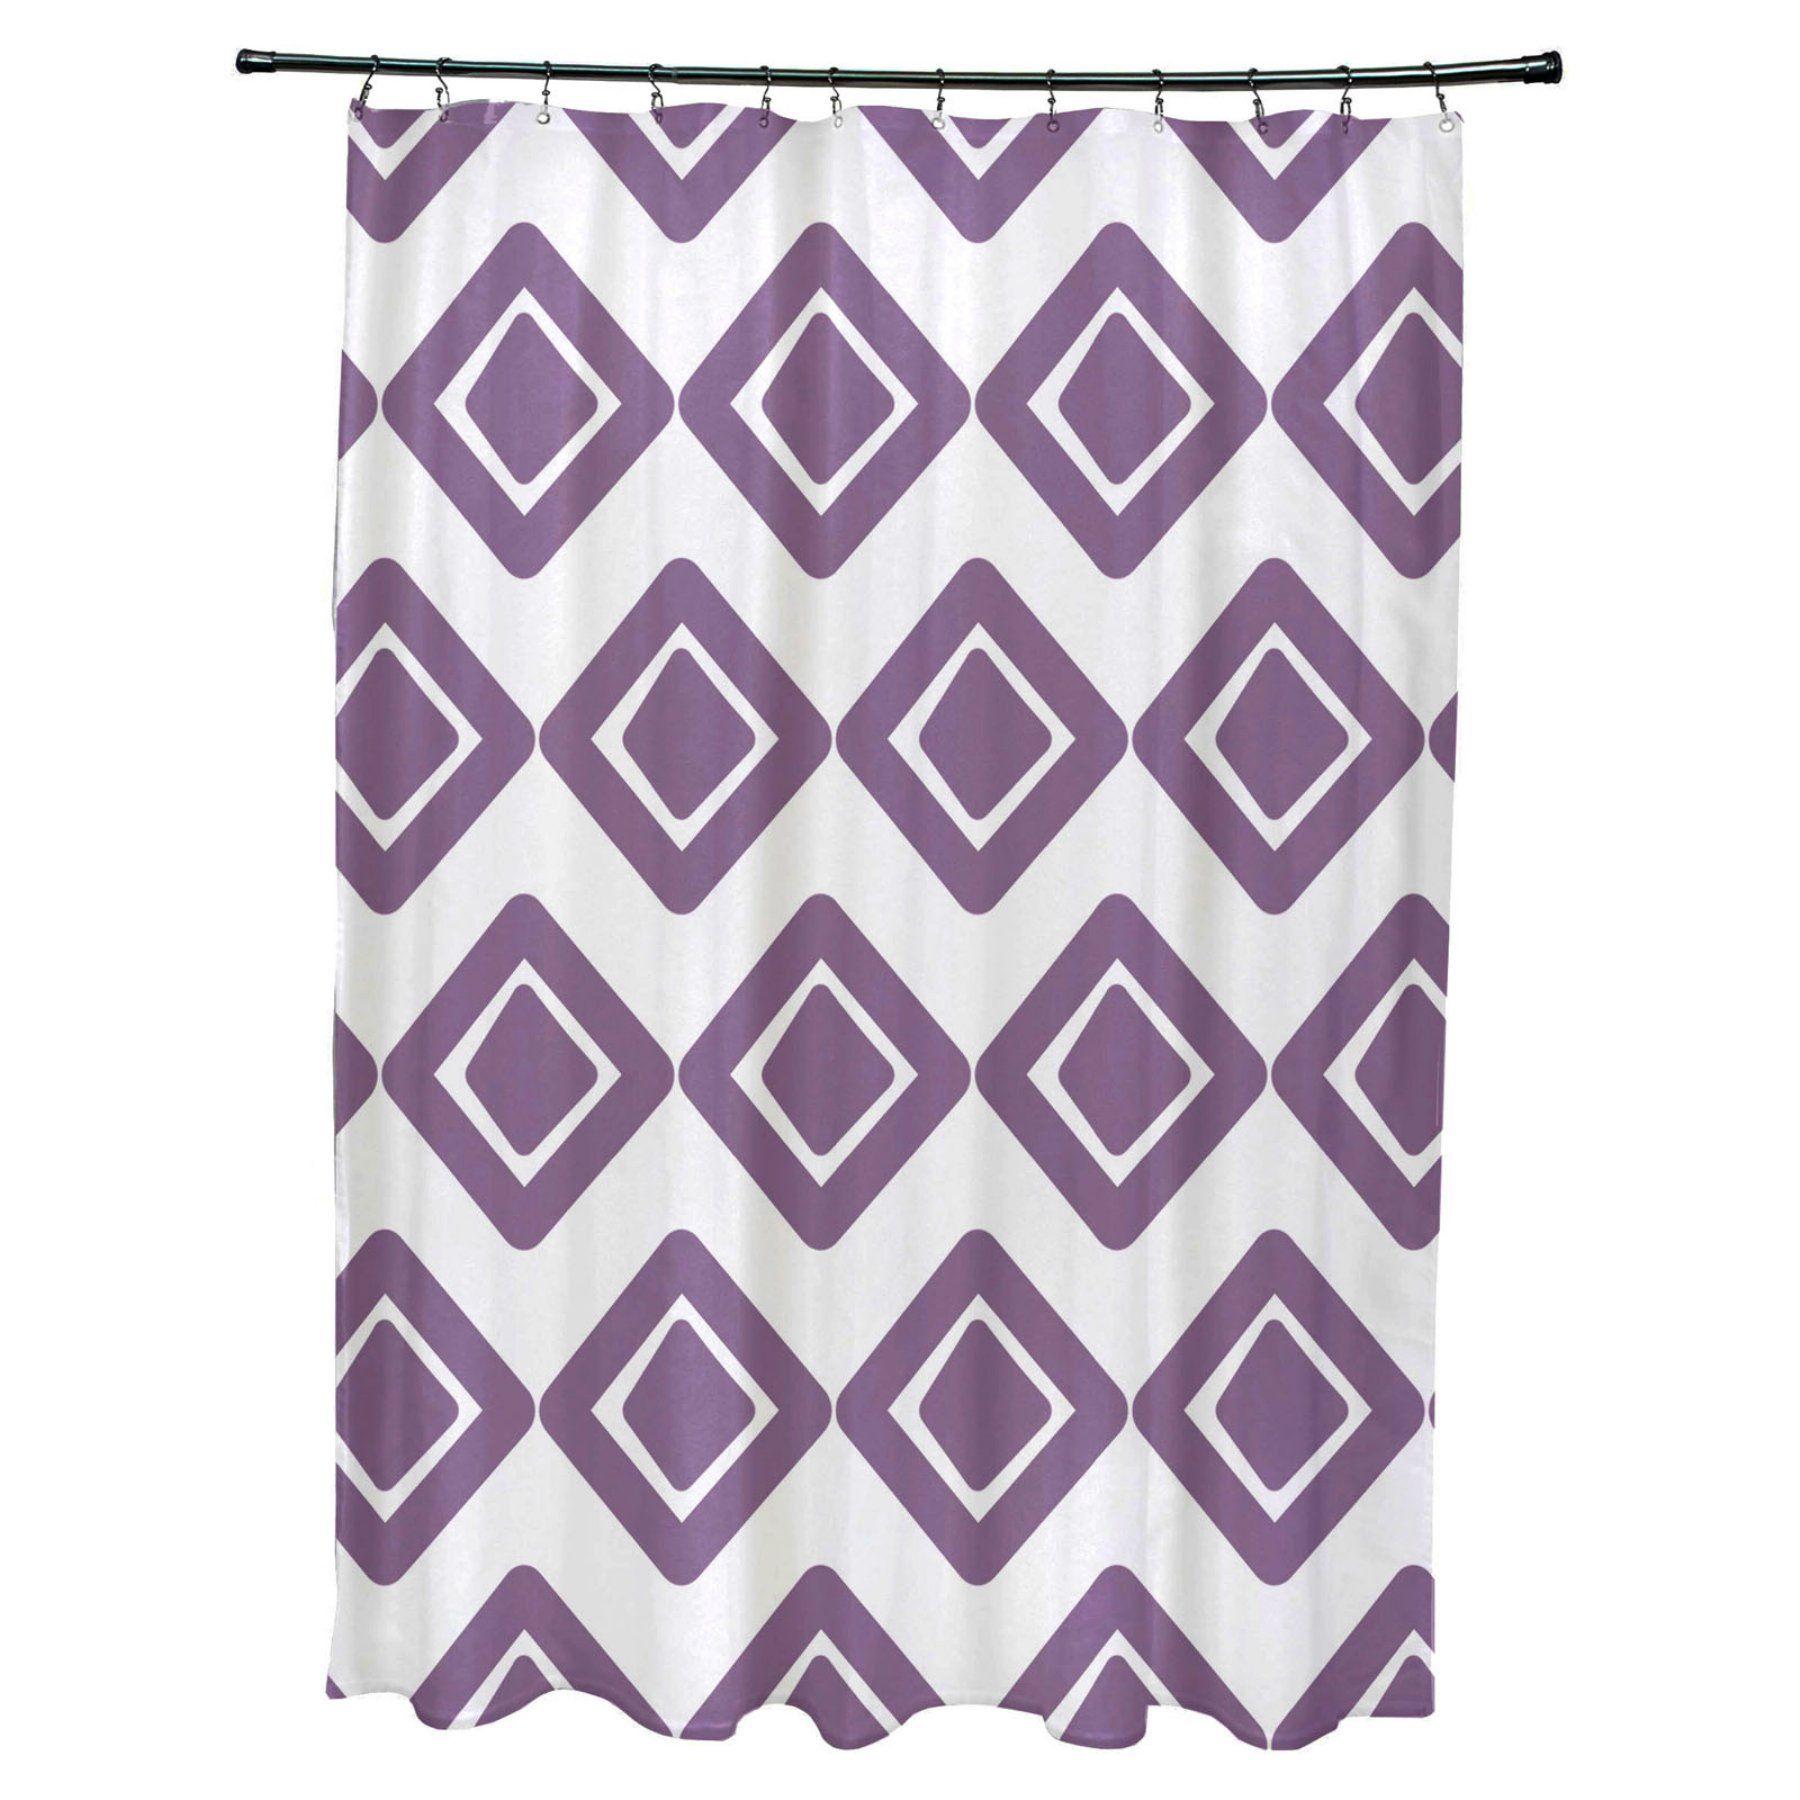 E By Design Diamond Jive 1 Polyester Shower Curtain Scg823bl1